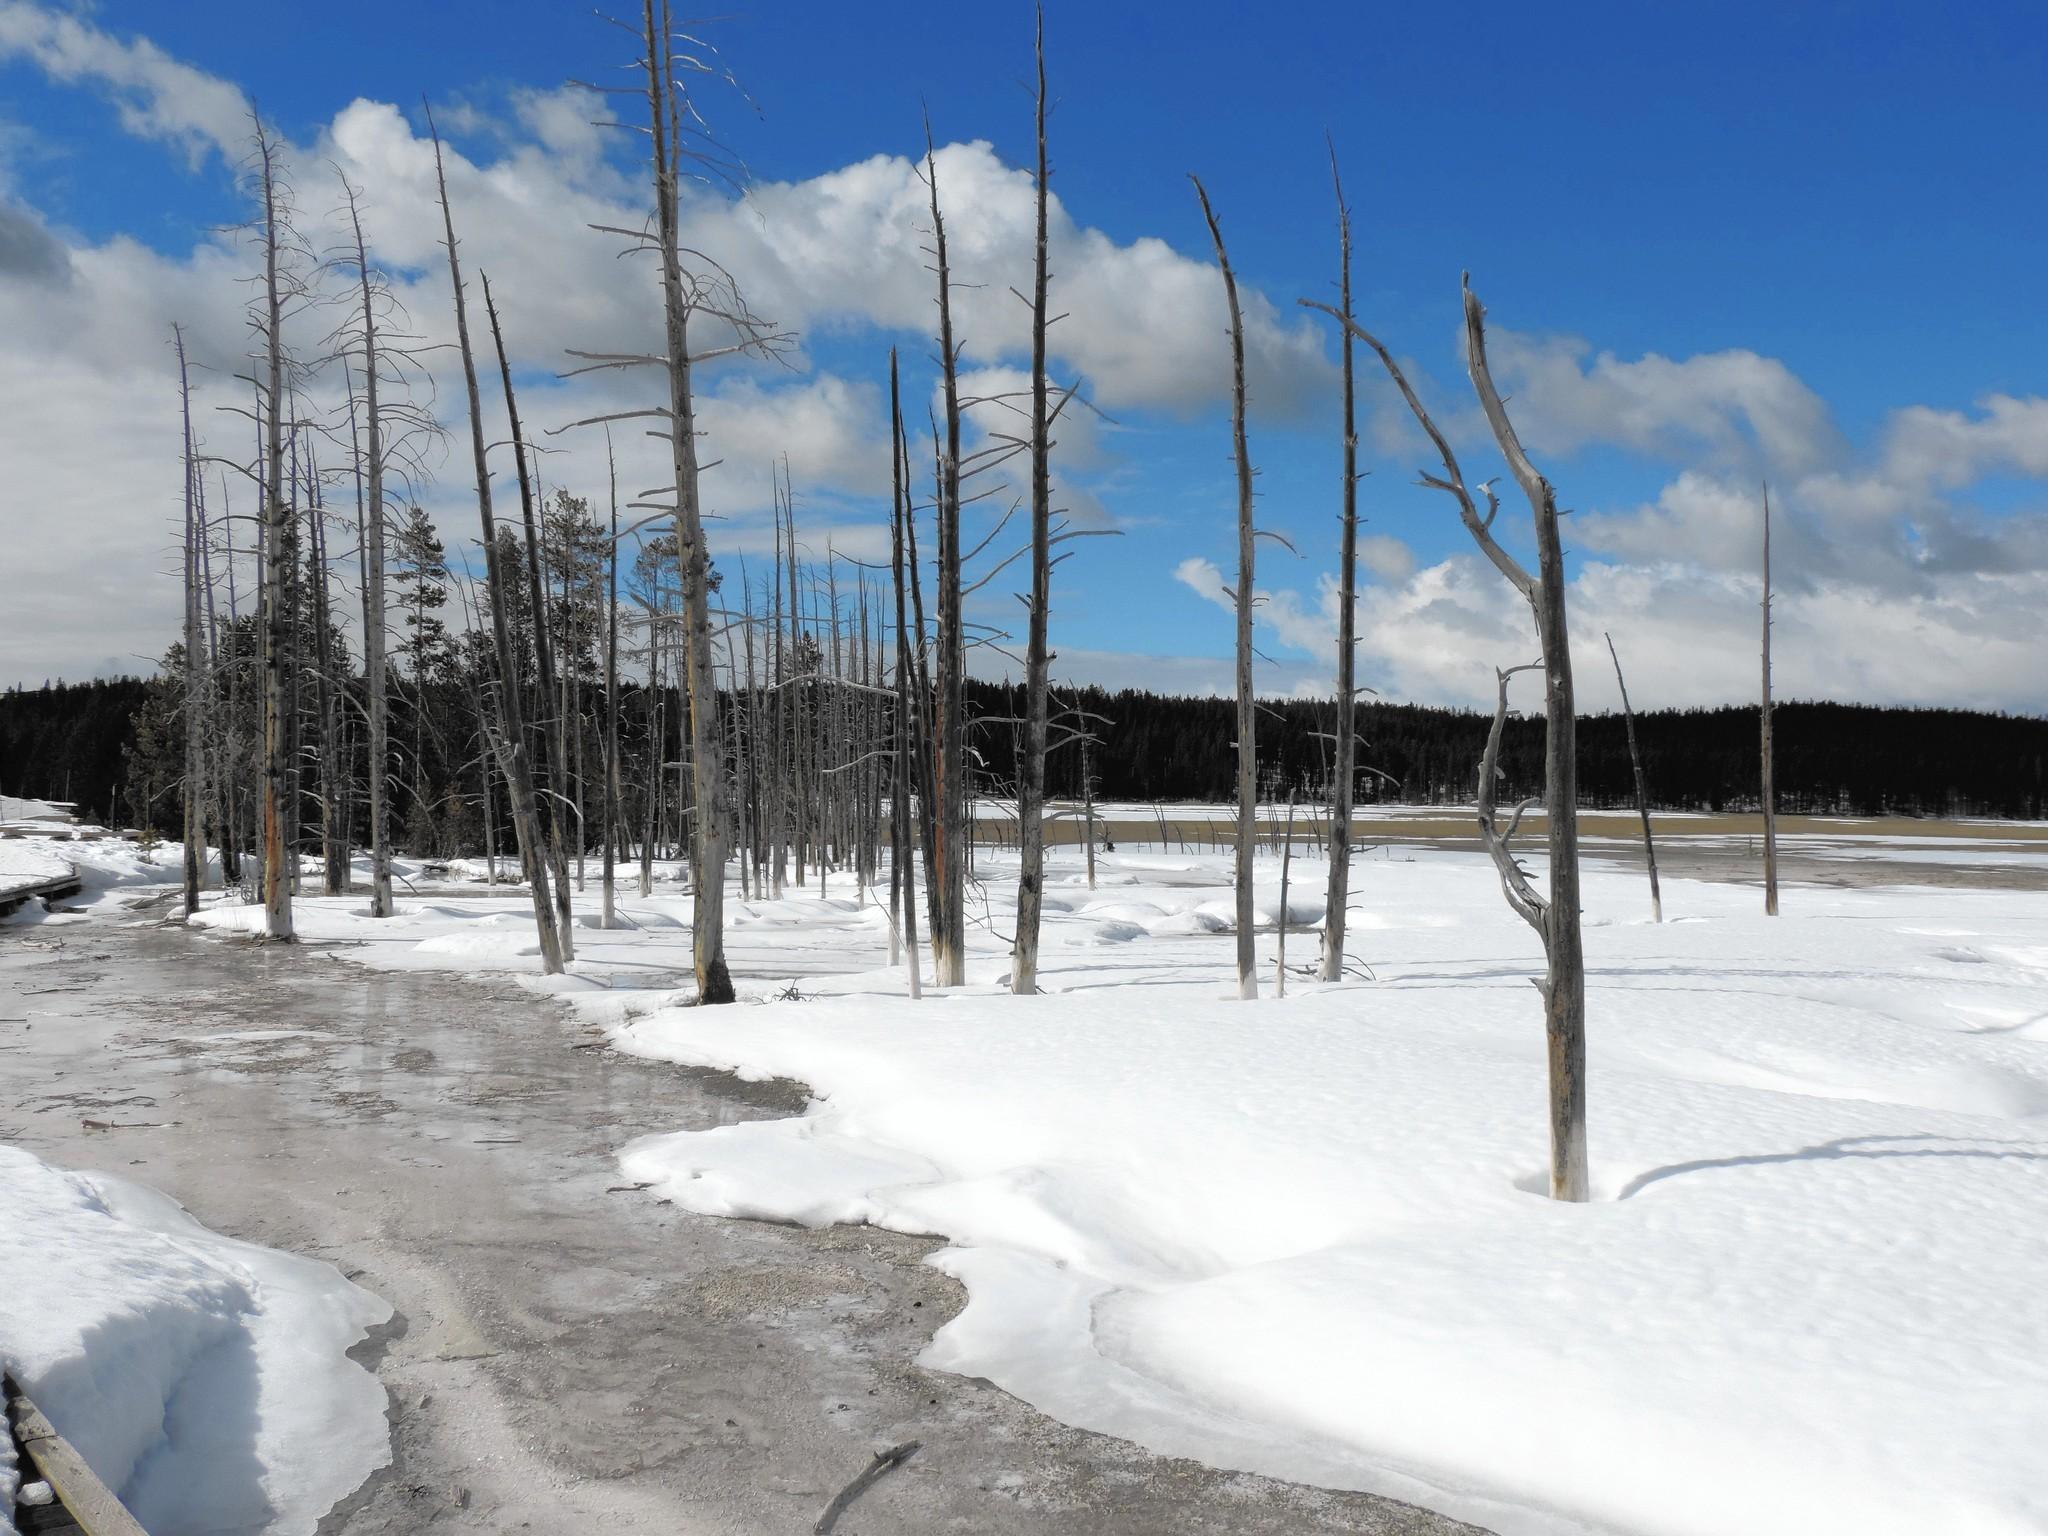 Montana's Big Sky embraces winter